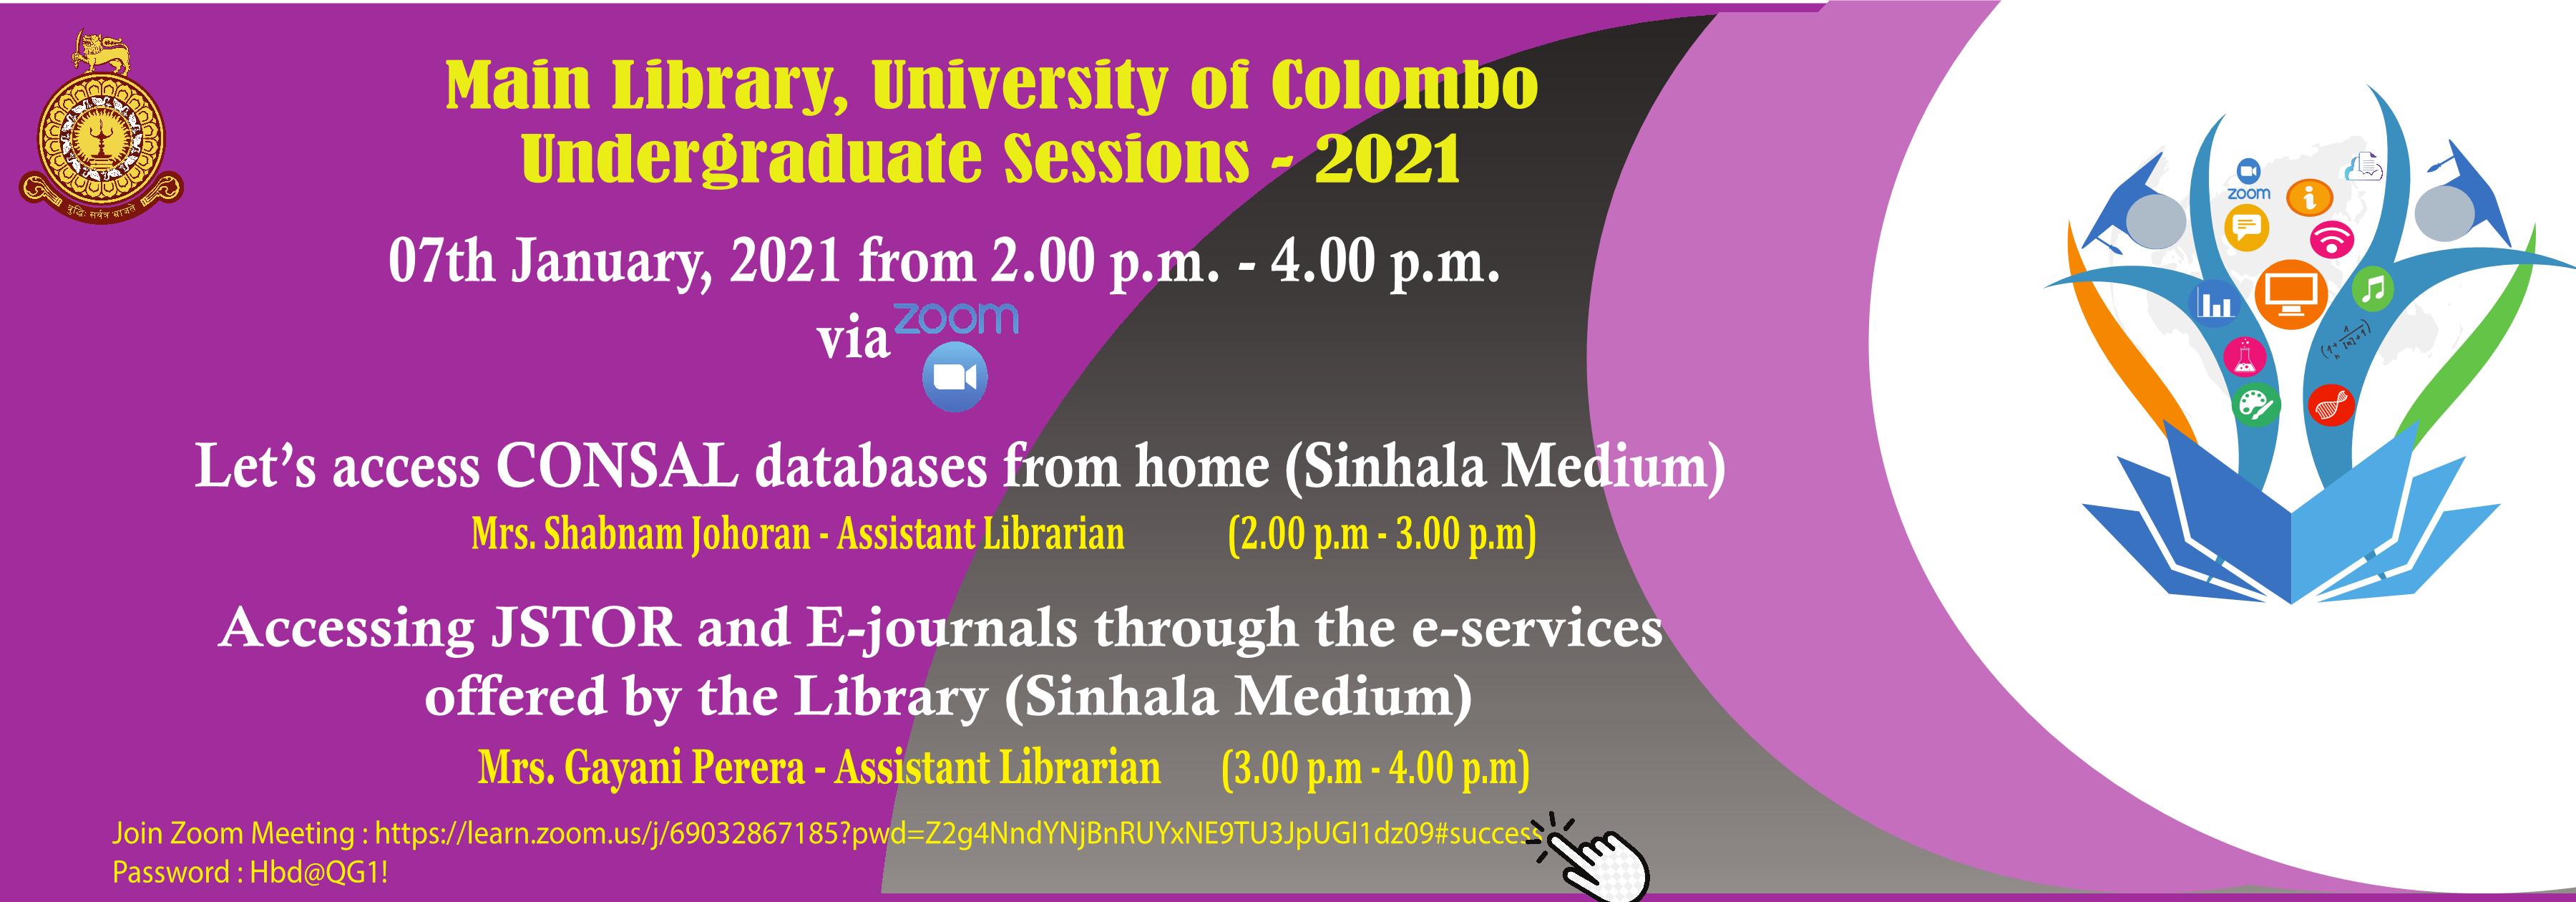 Webinars for undergraduates